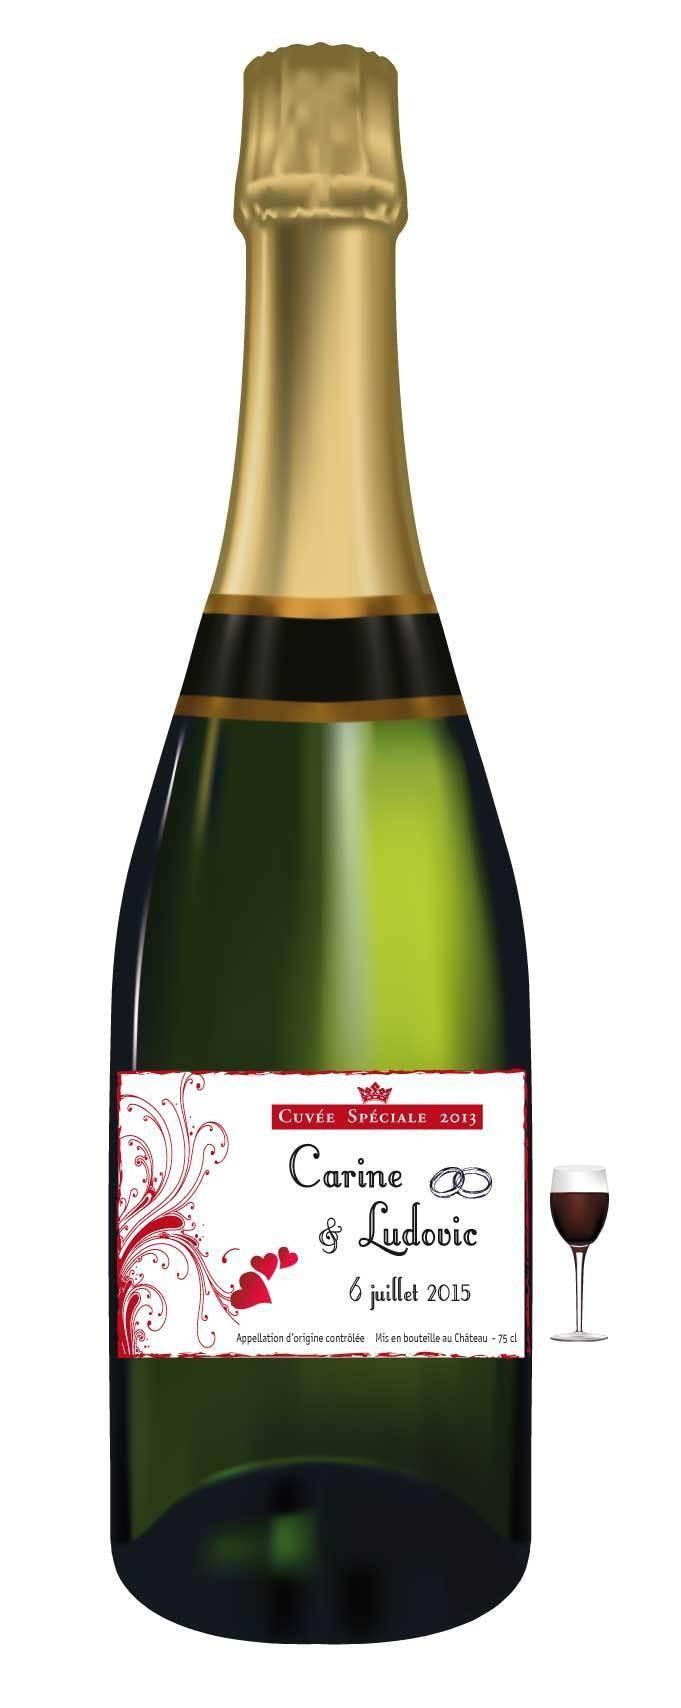 etiquettes bouteille mariage personnalise arabesques rouge passion grenoble - Tiquette Personnalise Champagne Mariage